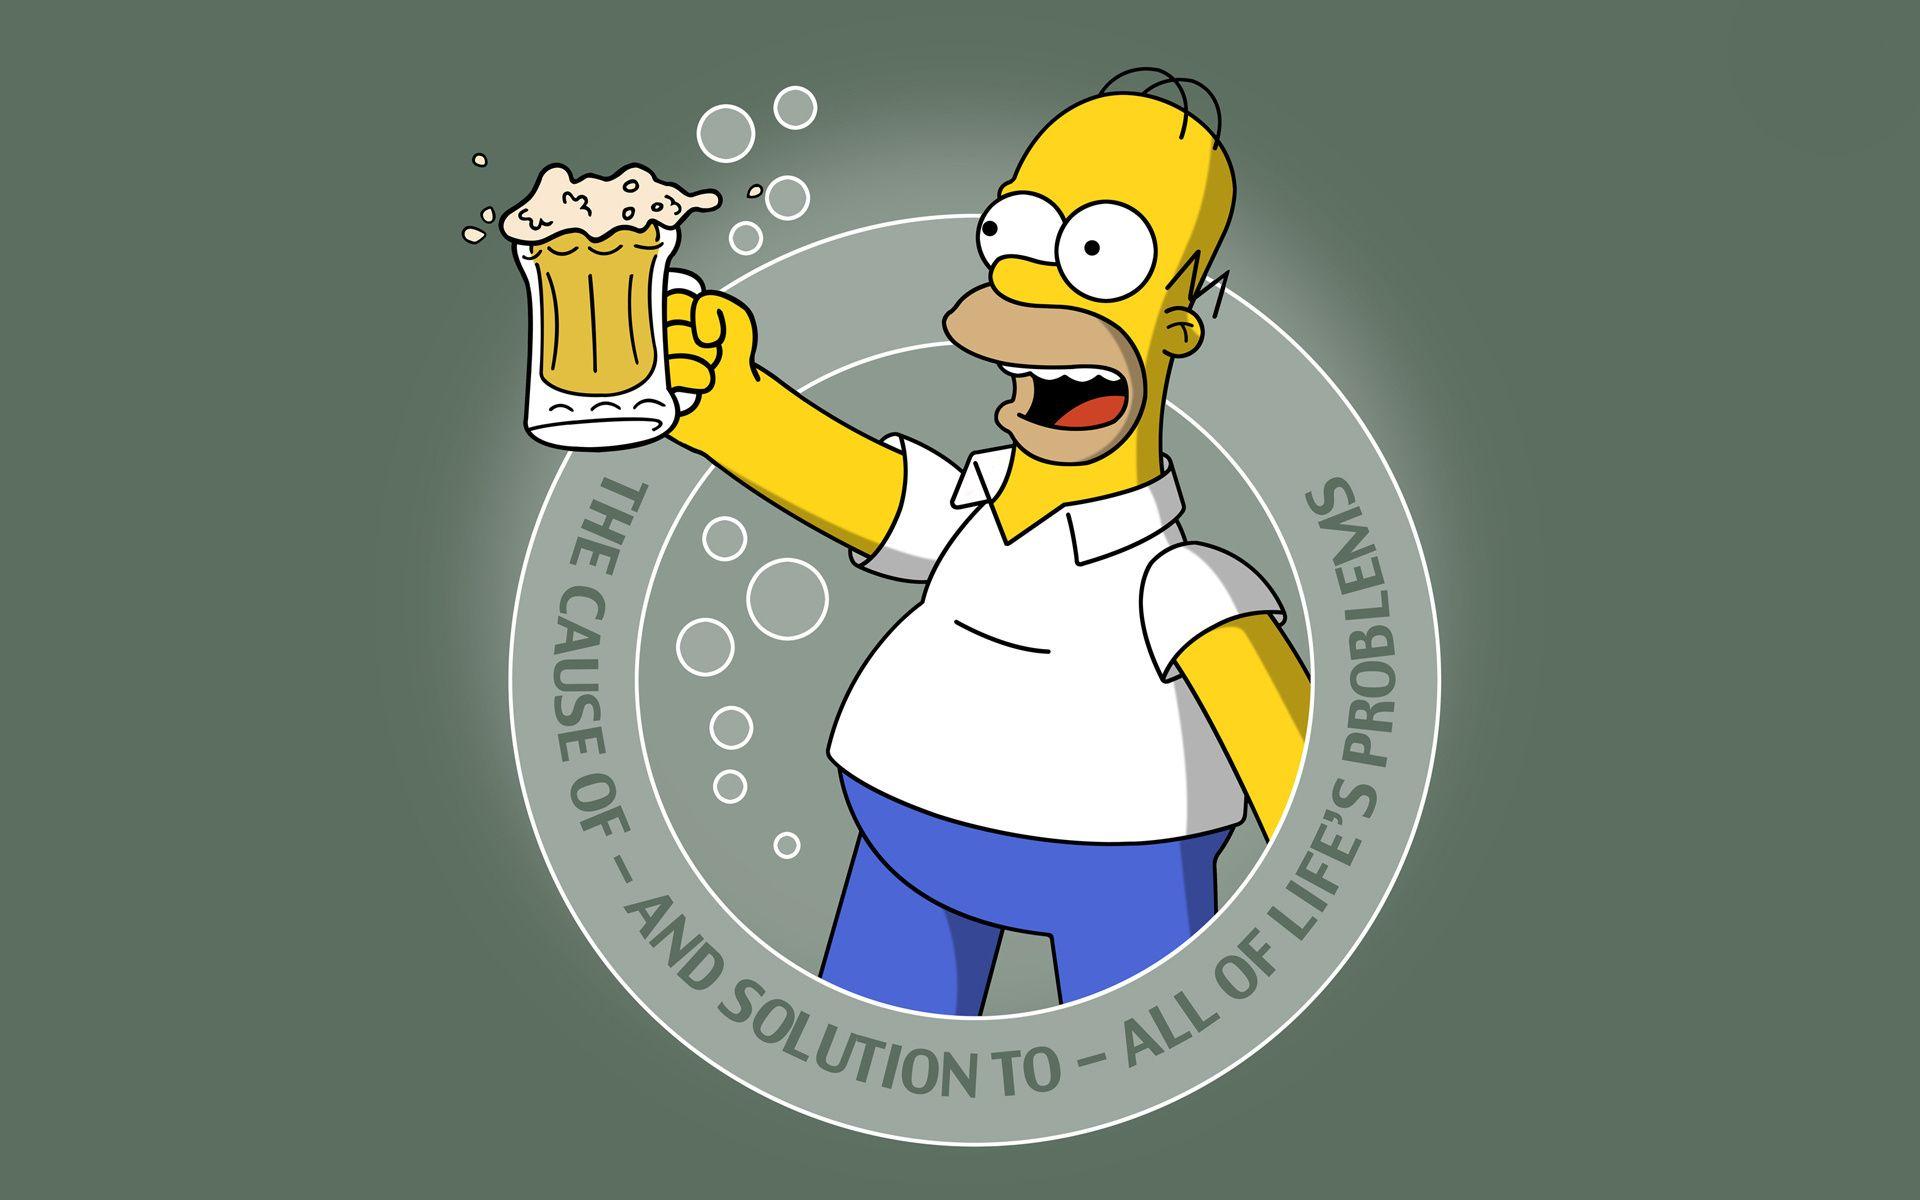 Cartoon the simpsons Homer beer beer simpsons homer Android